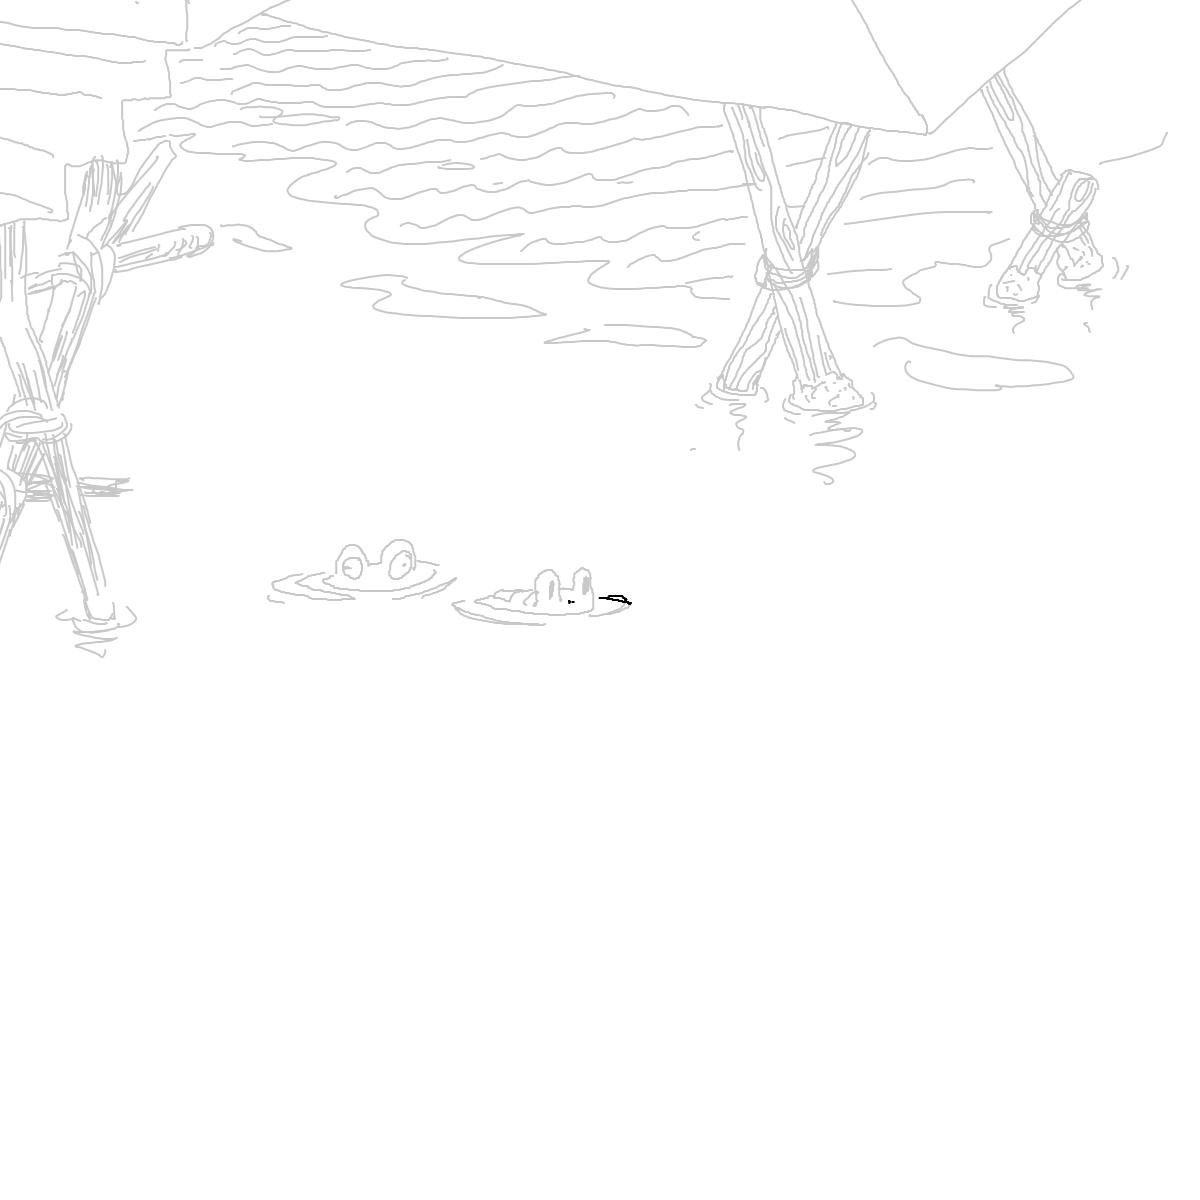 BAAAM drawing#8978 lat:78.4205245971679700lng: -4.4856724739074710